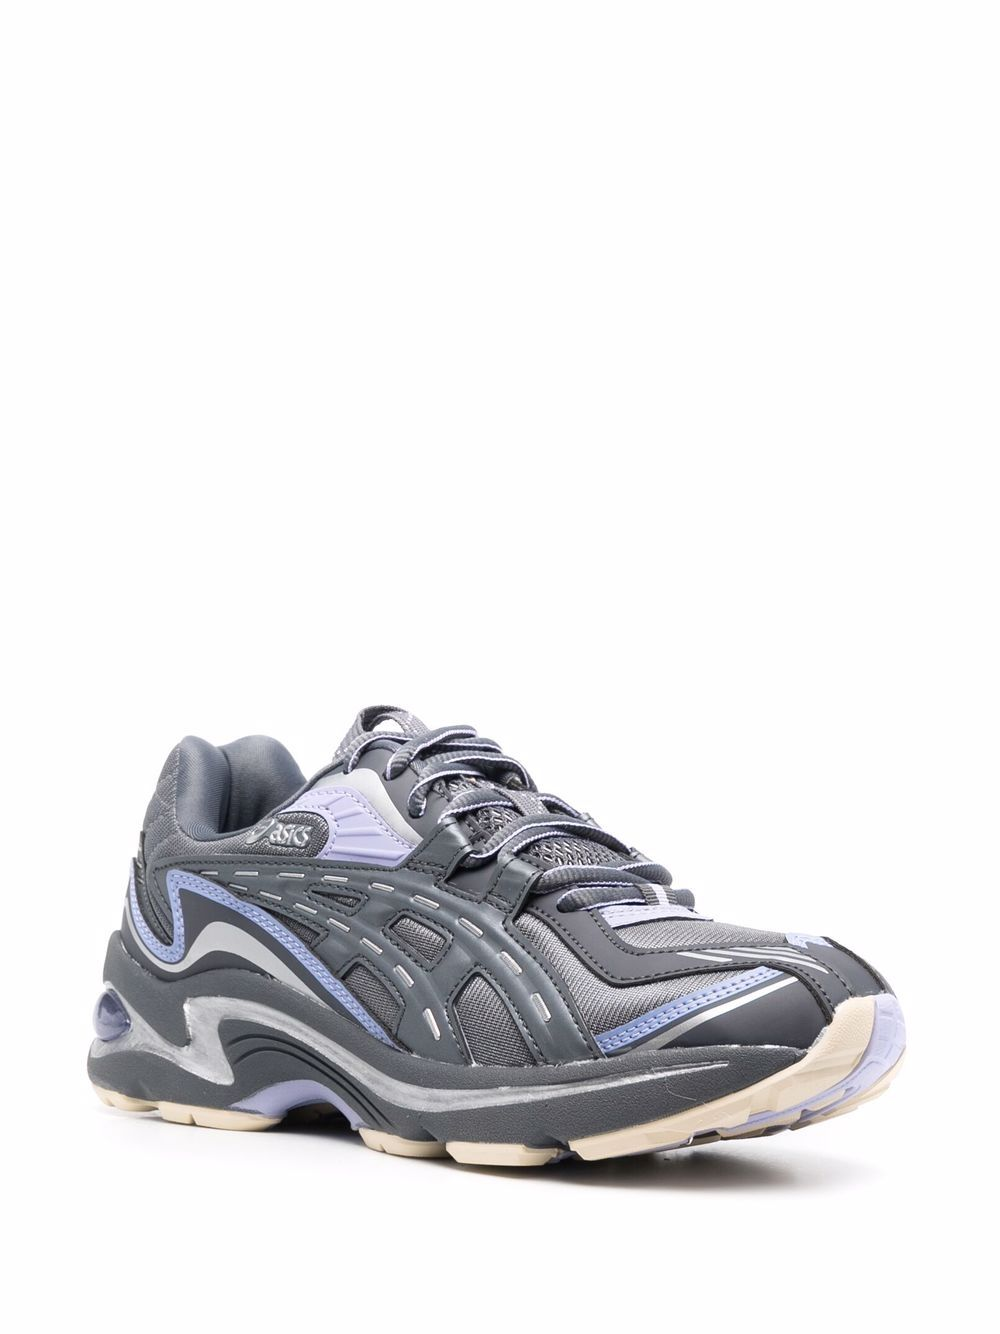 s gel preleus sneakers woman gray ASICS   Sneakers   1202A158020